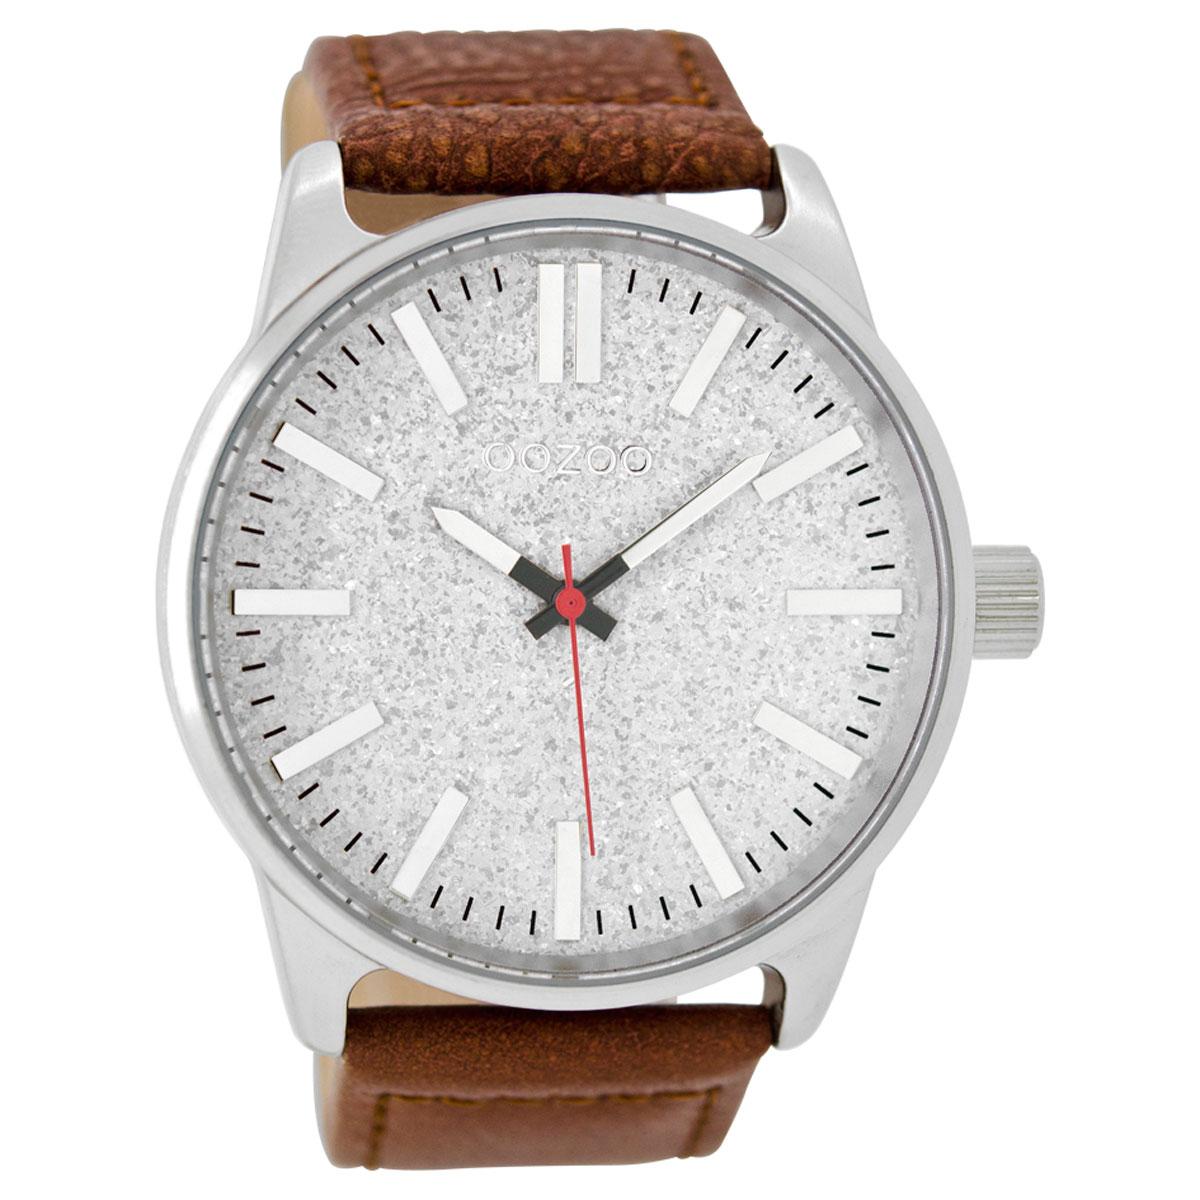 OOZOO Timepieces C9060 ανδρικό ρολόι XL με ασημί μεταλλική κάσα και καφέ  δερμάτινο λουράκι 6819ceb5ba1